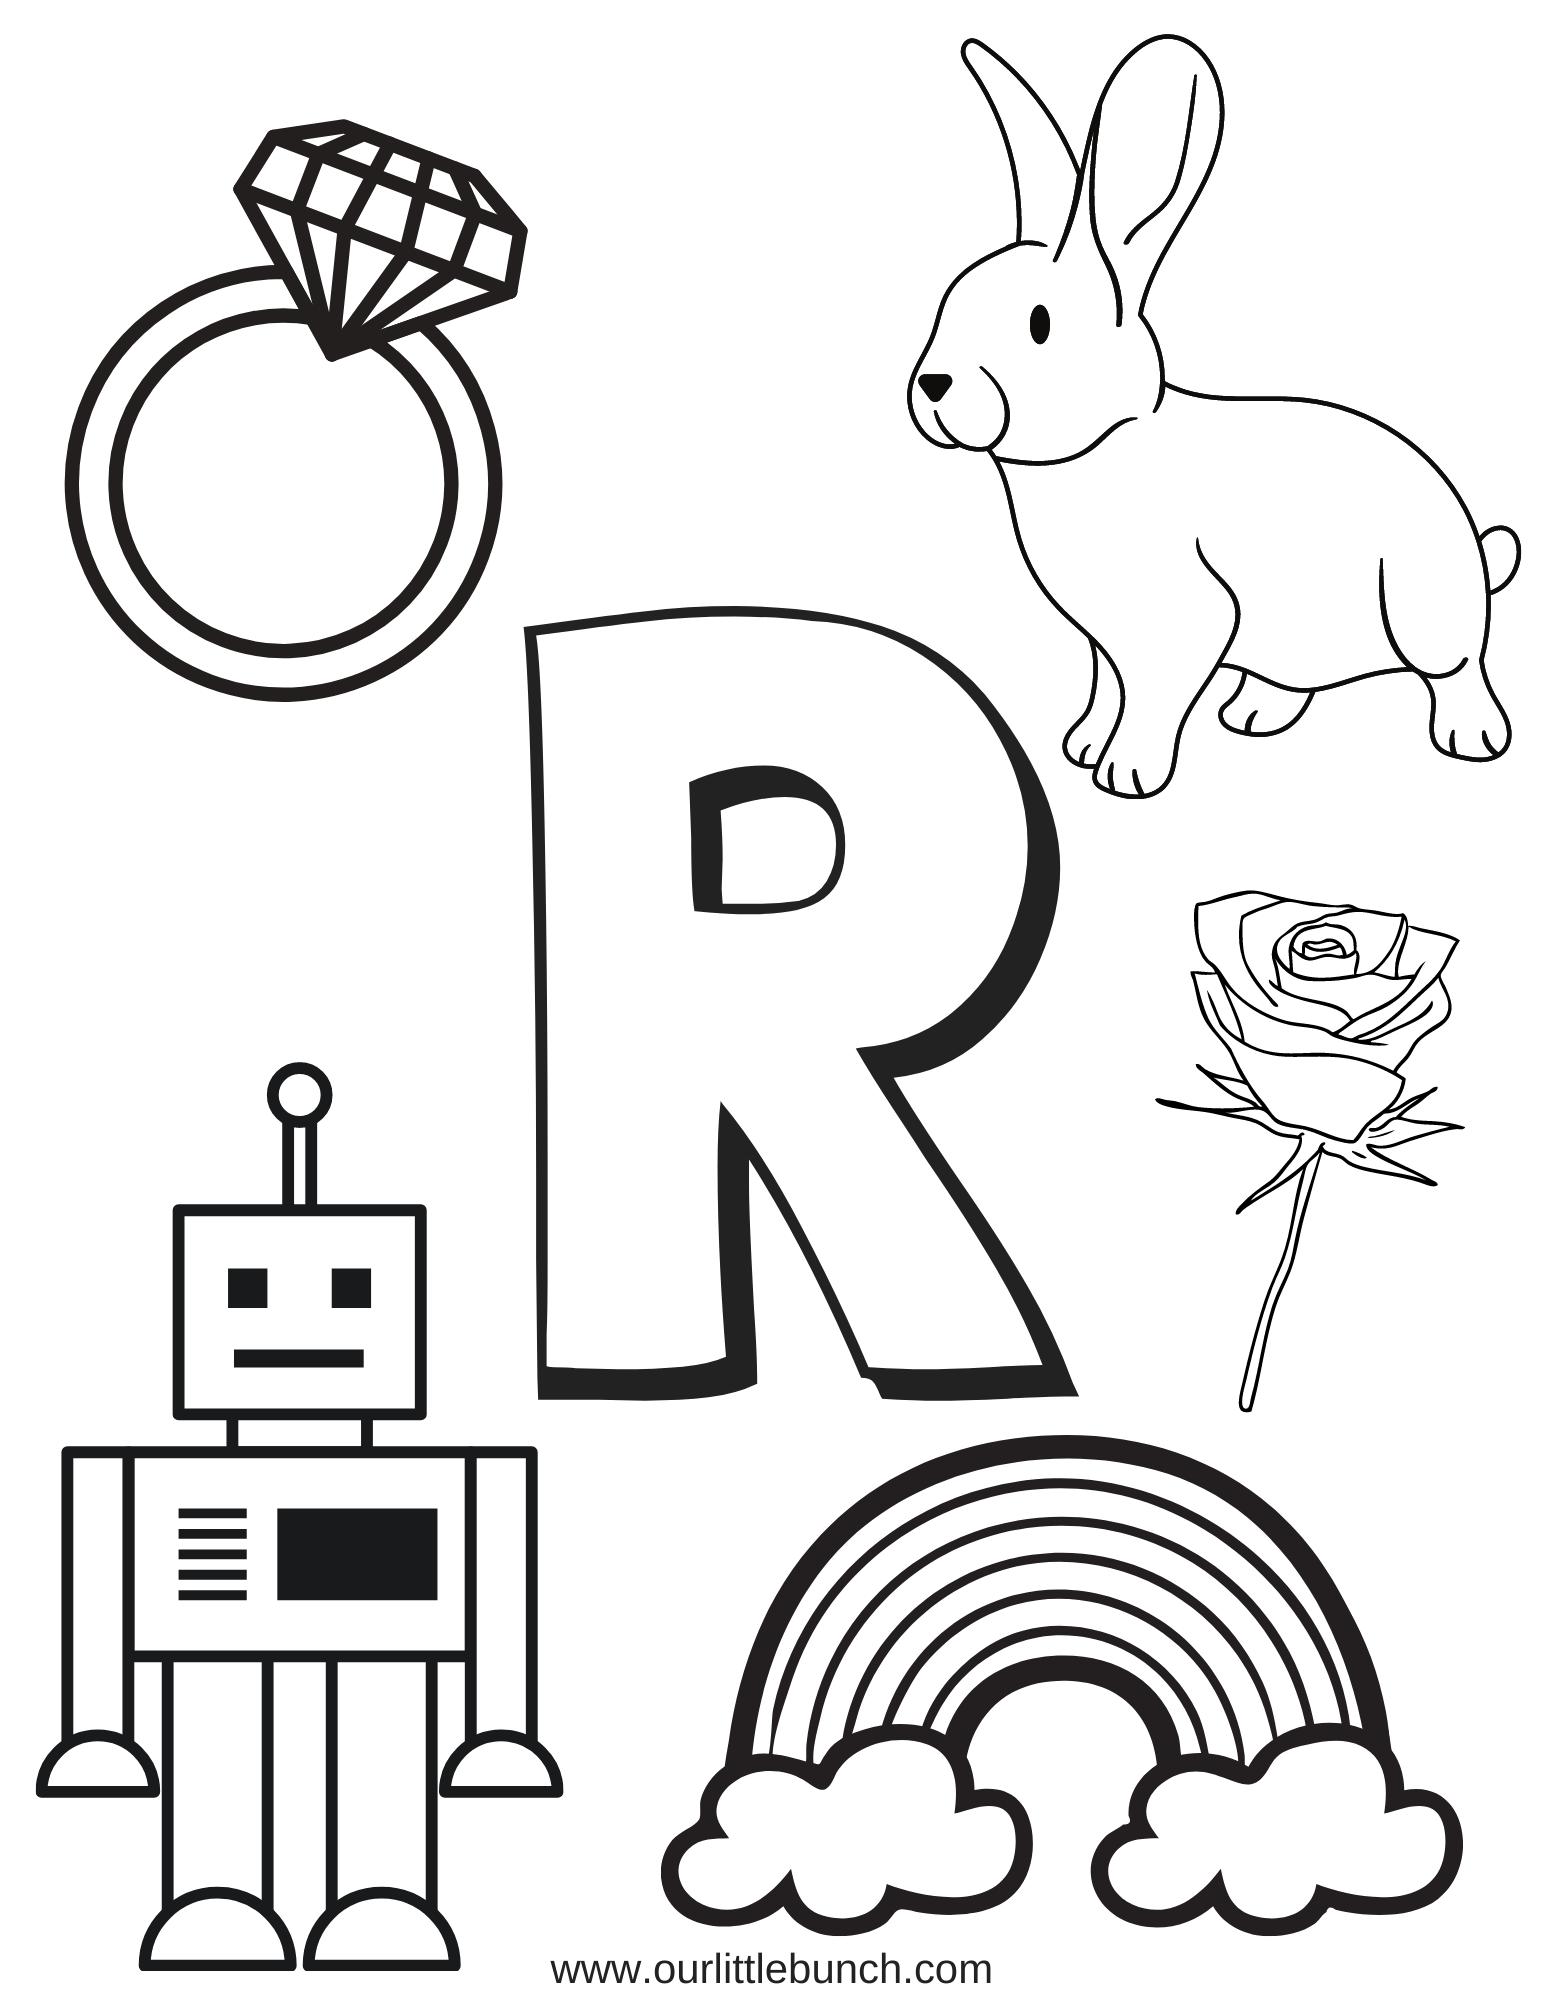 Letter R Pintable 2